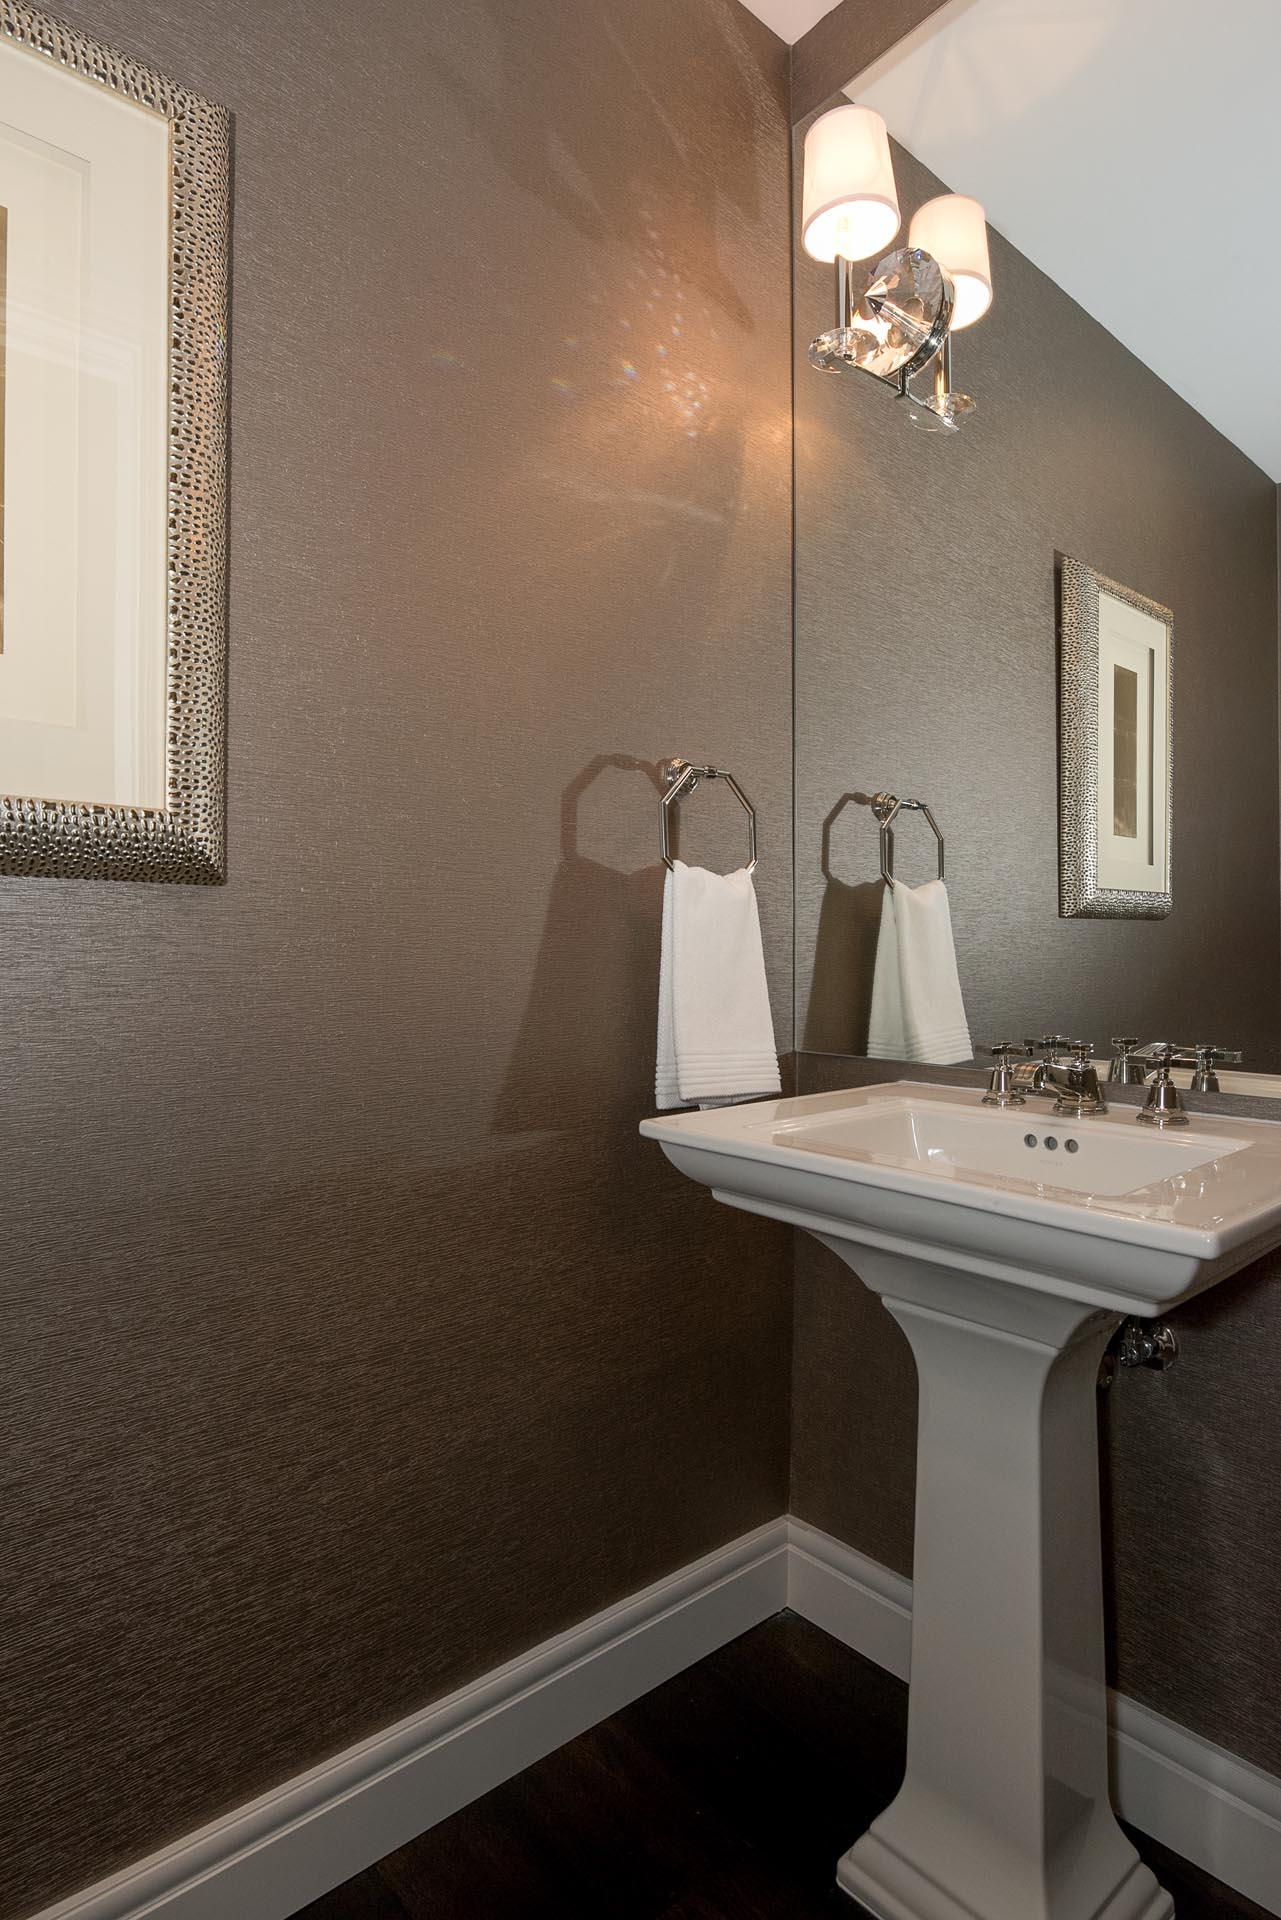 Condo Bathroom Sink Design | H Residence | Midland, MI